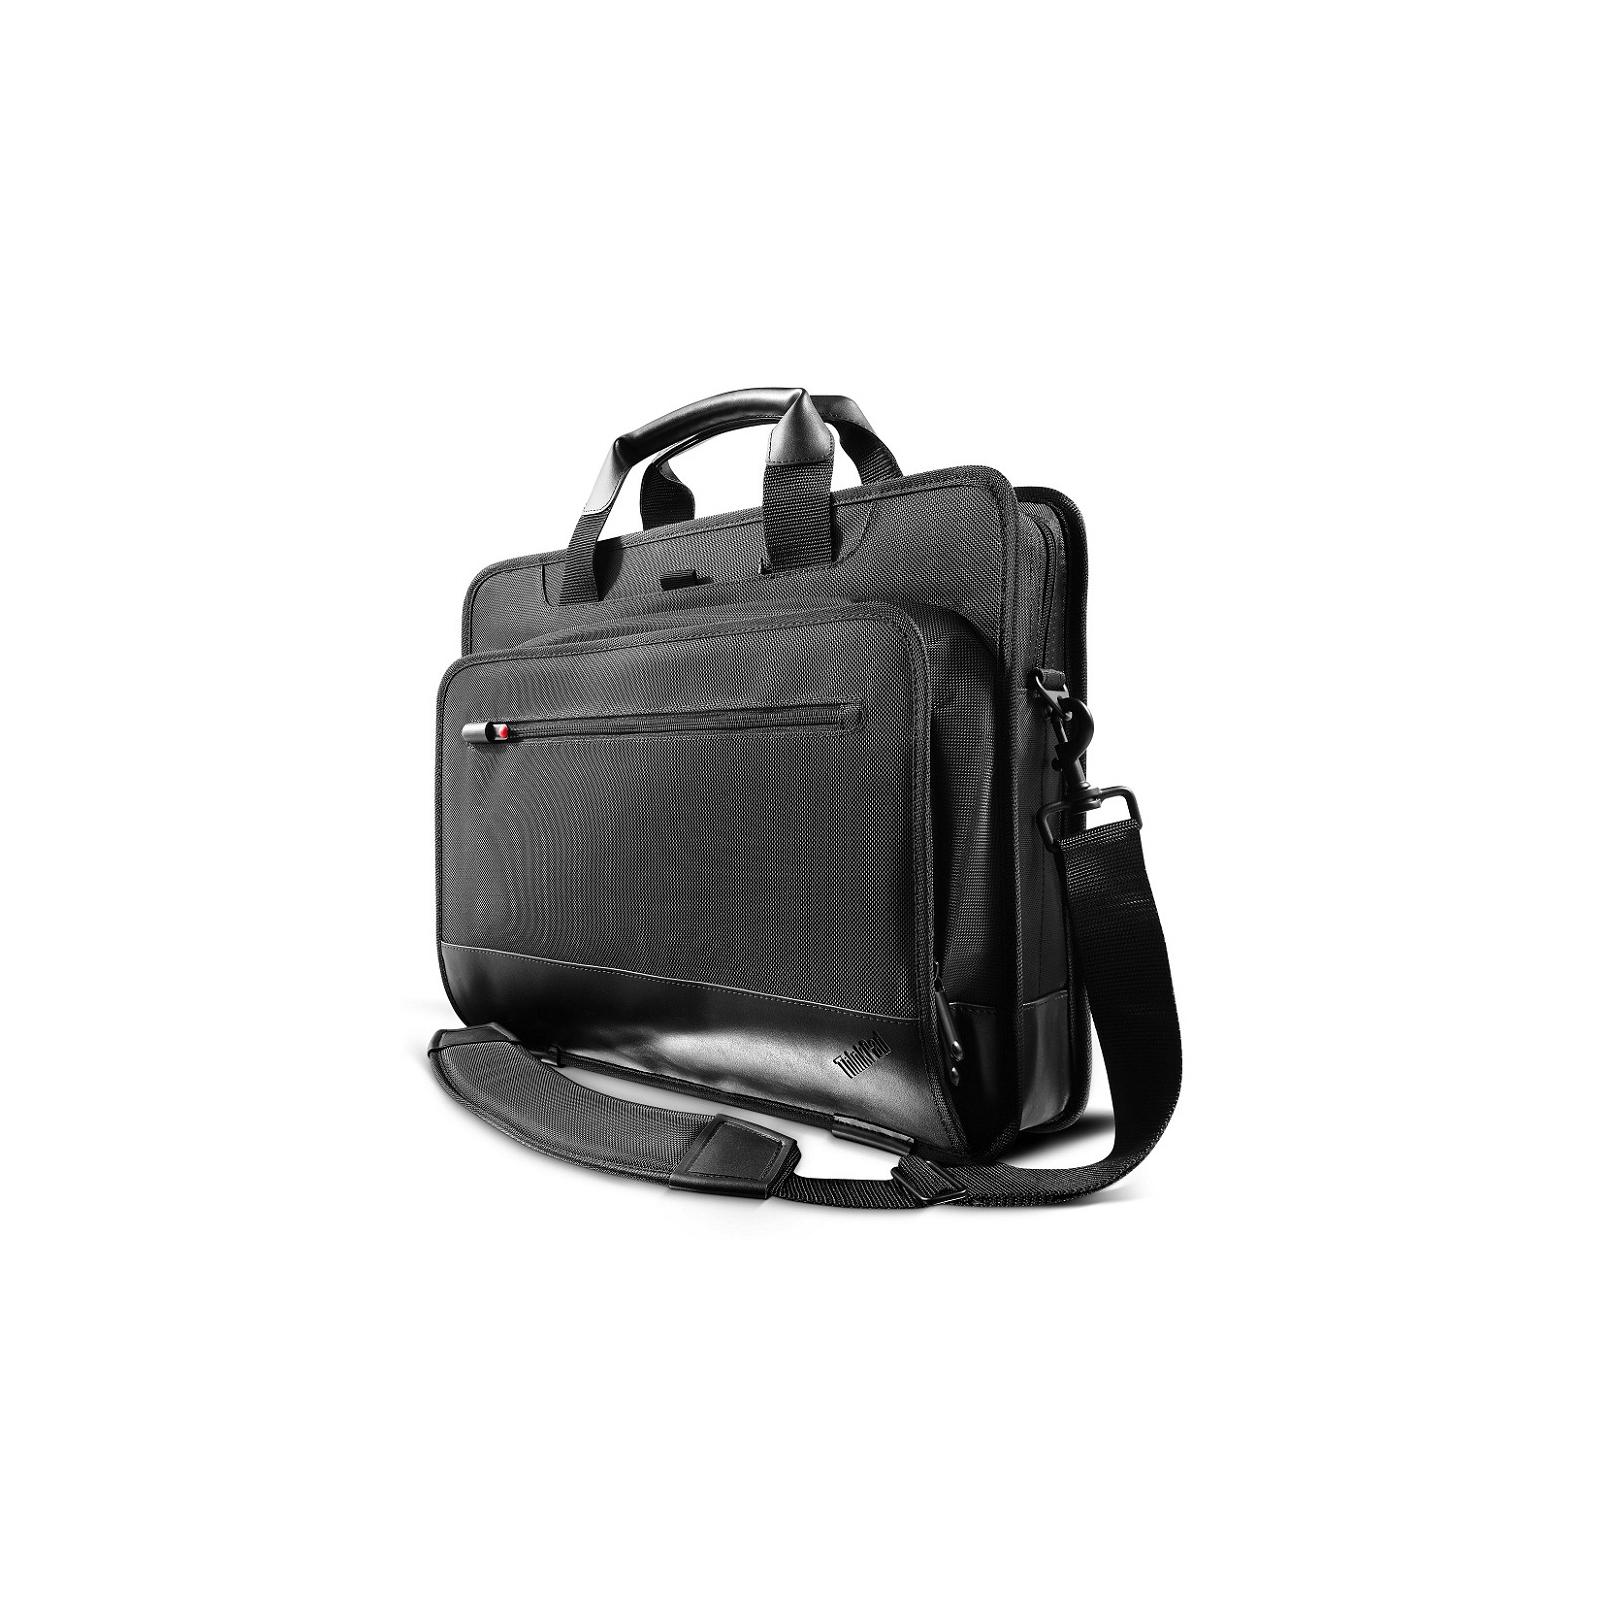 Сумка для ноутбука Lenovo 15.4 ThinkPad Business Topload Case (43R2476)